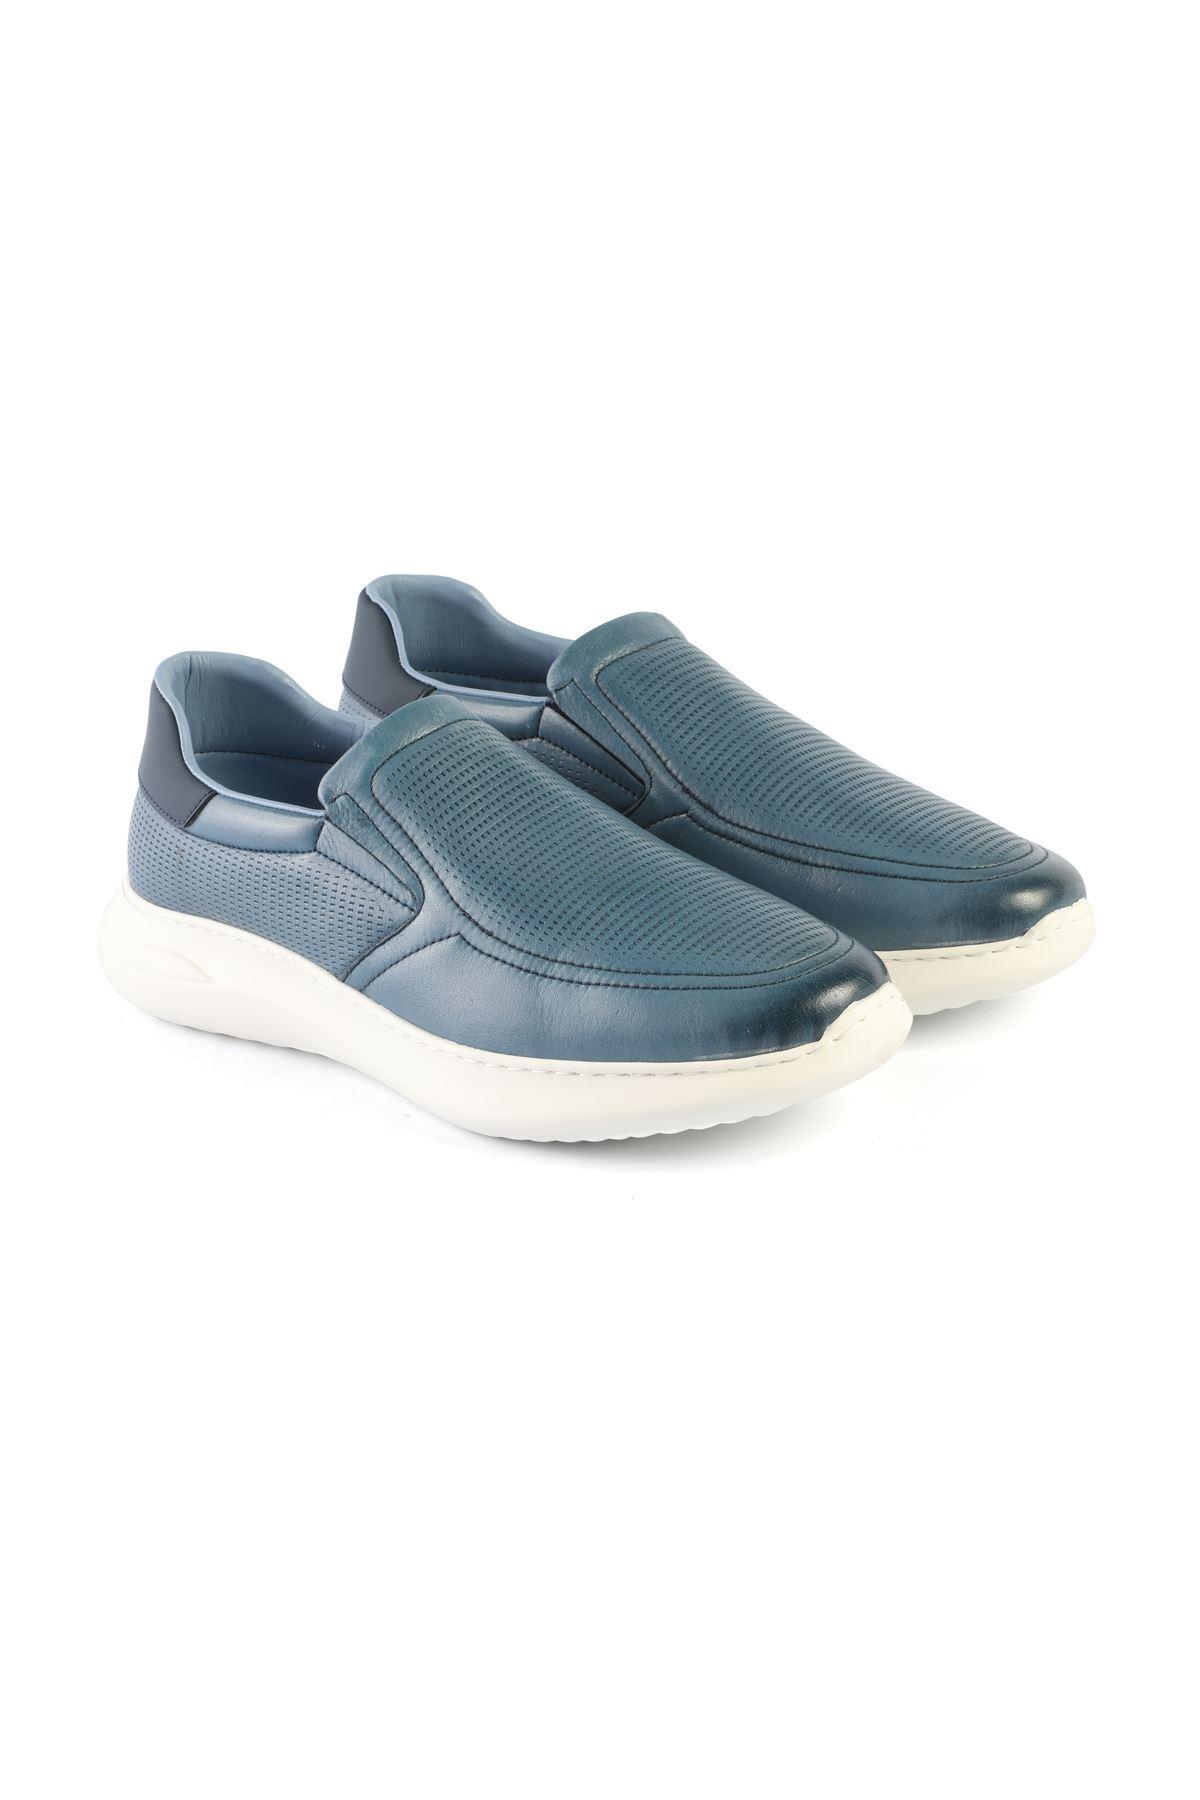 Libero L3413 Blue Sport Shoes